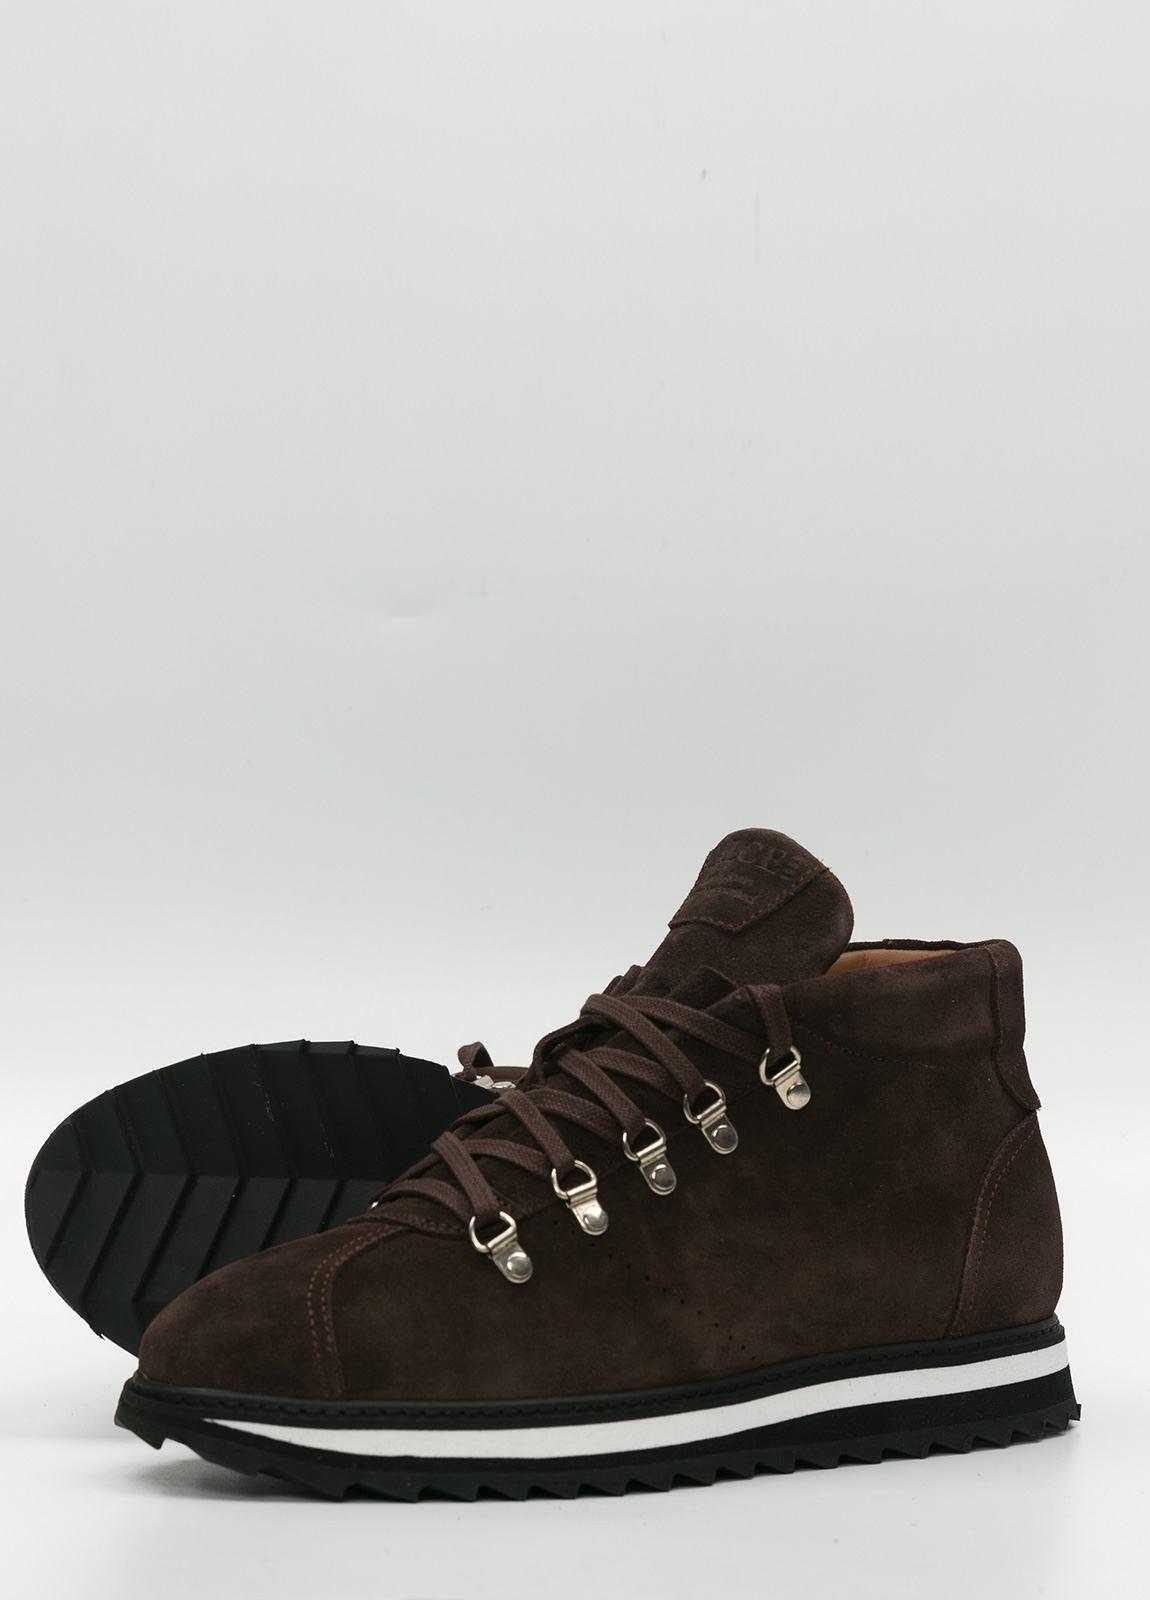 Bota sport de cordones, color marrón oscuro. 100% Piel Ante. - Ítem1